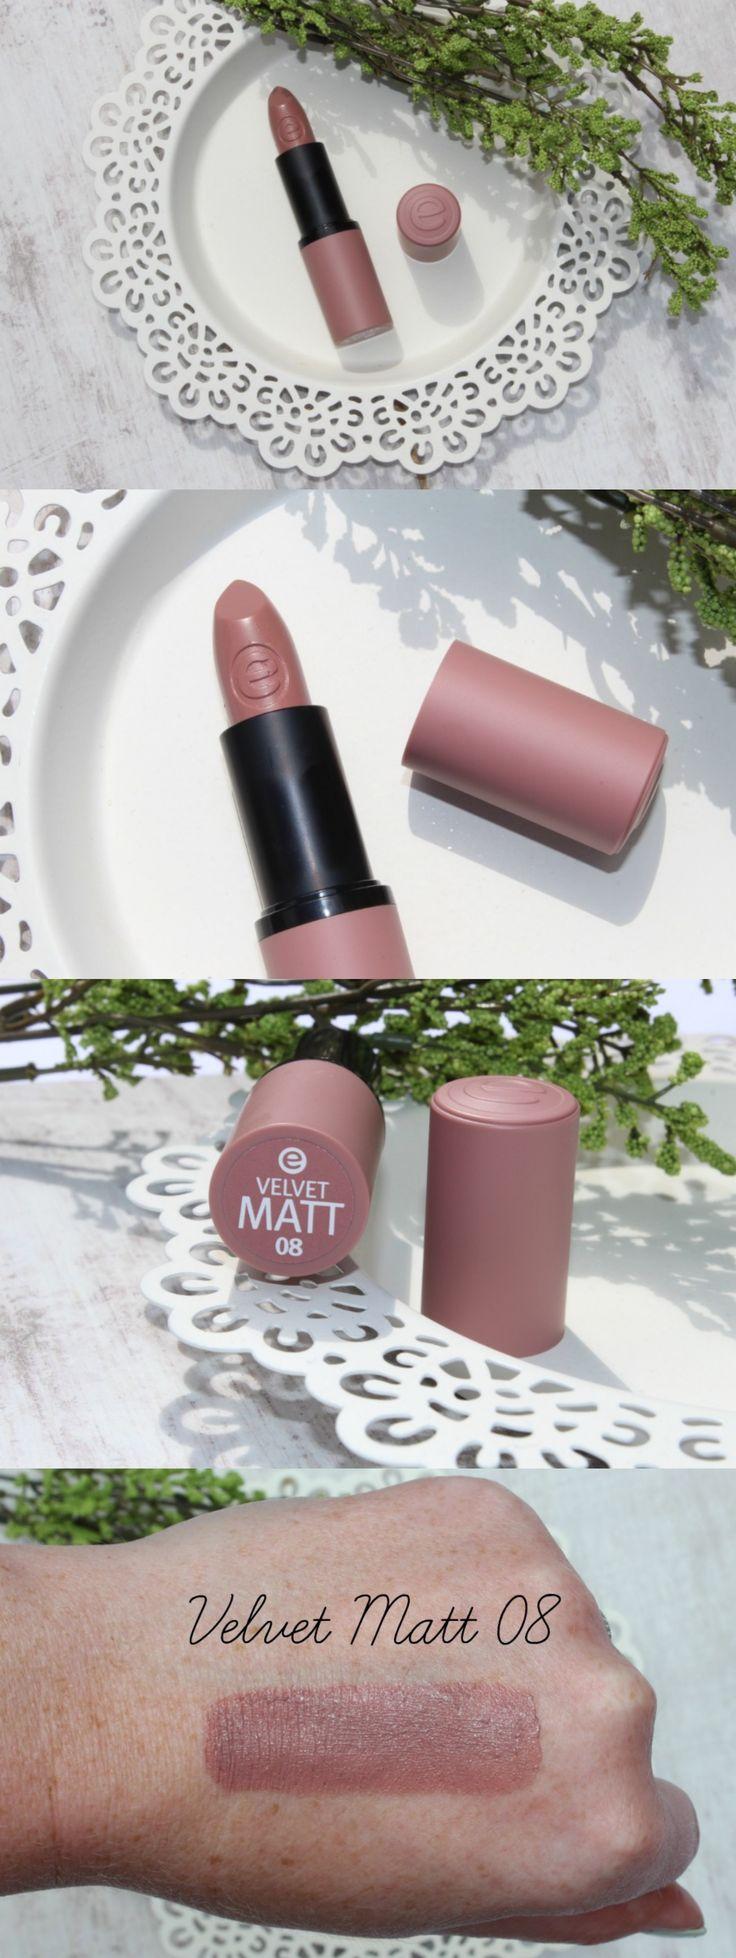 Essence Velvet Matt Lipstick Review & Photos - http://pinkparadisebeauty.blogspot.co.uk/2016/07/essence-velvet-matt-lipstick-review.html